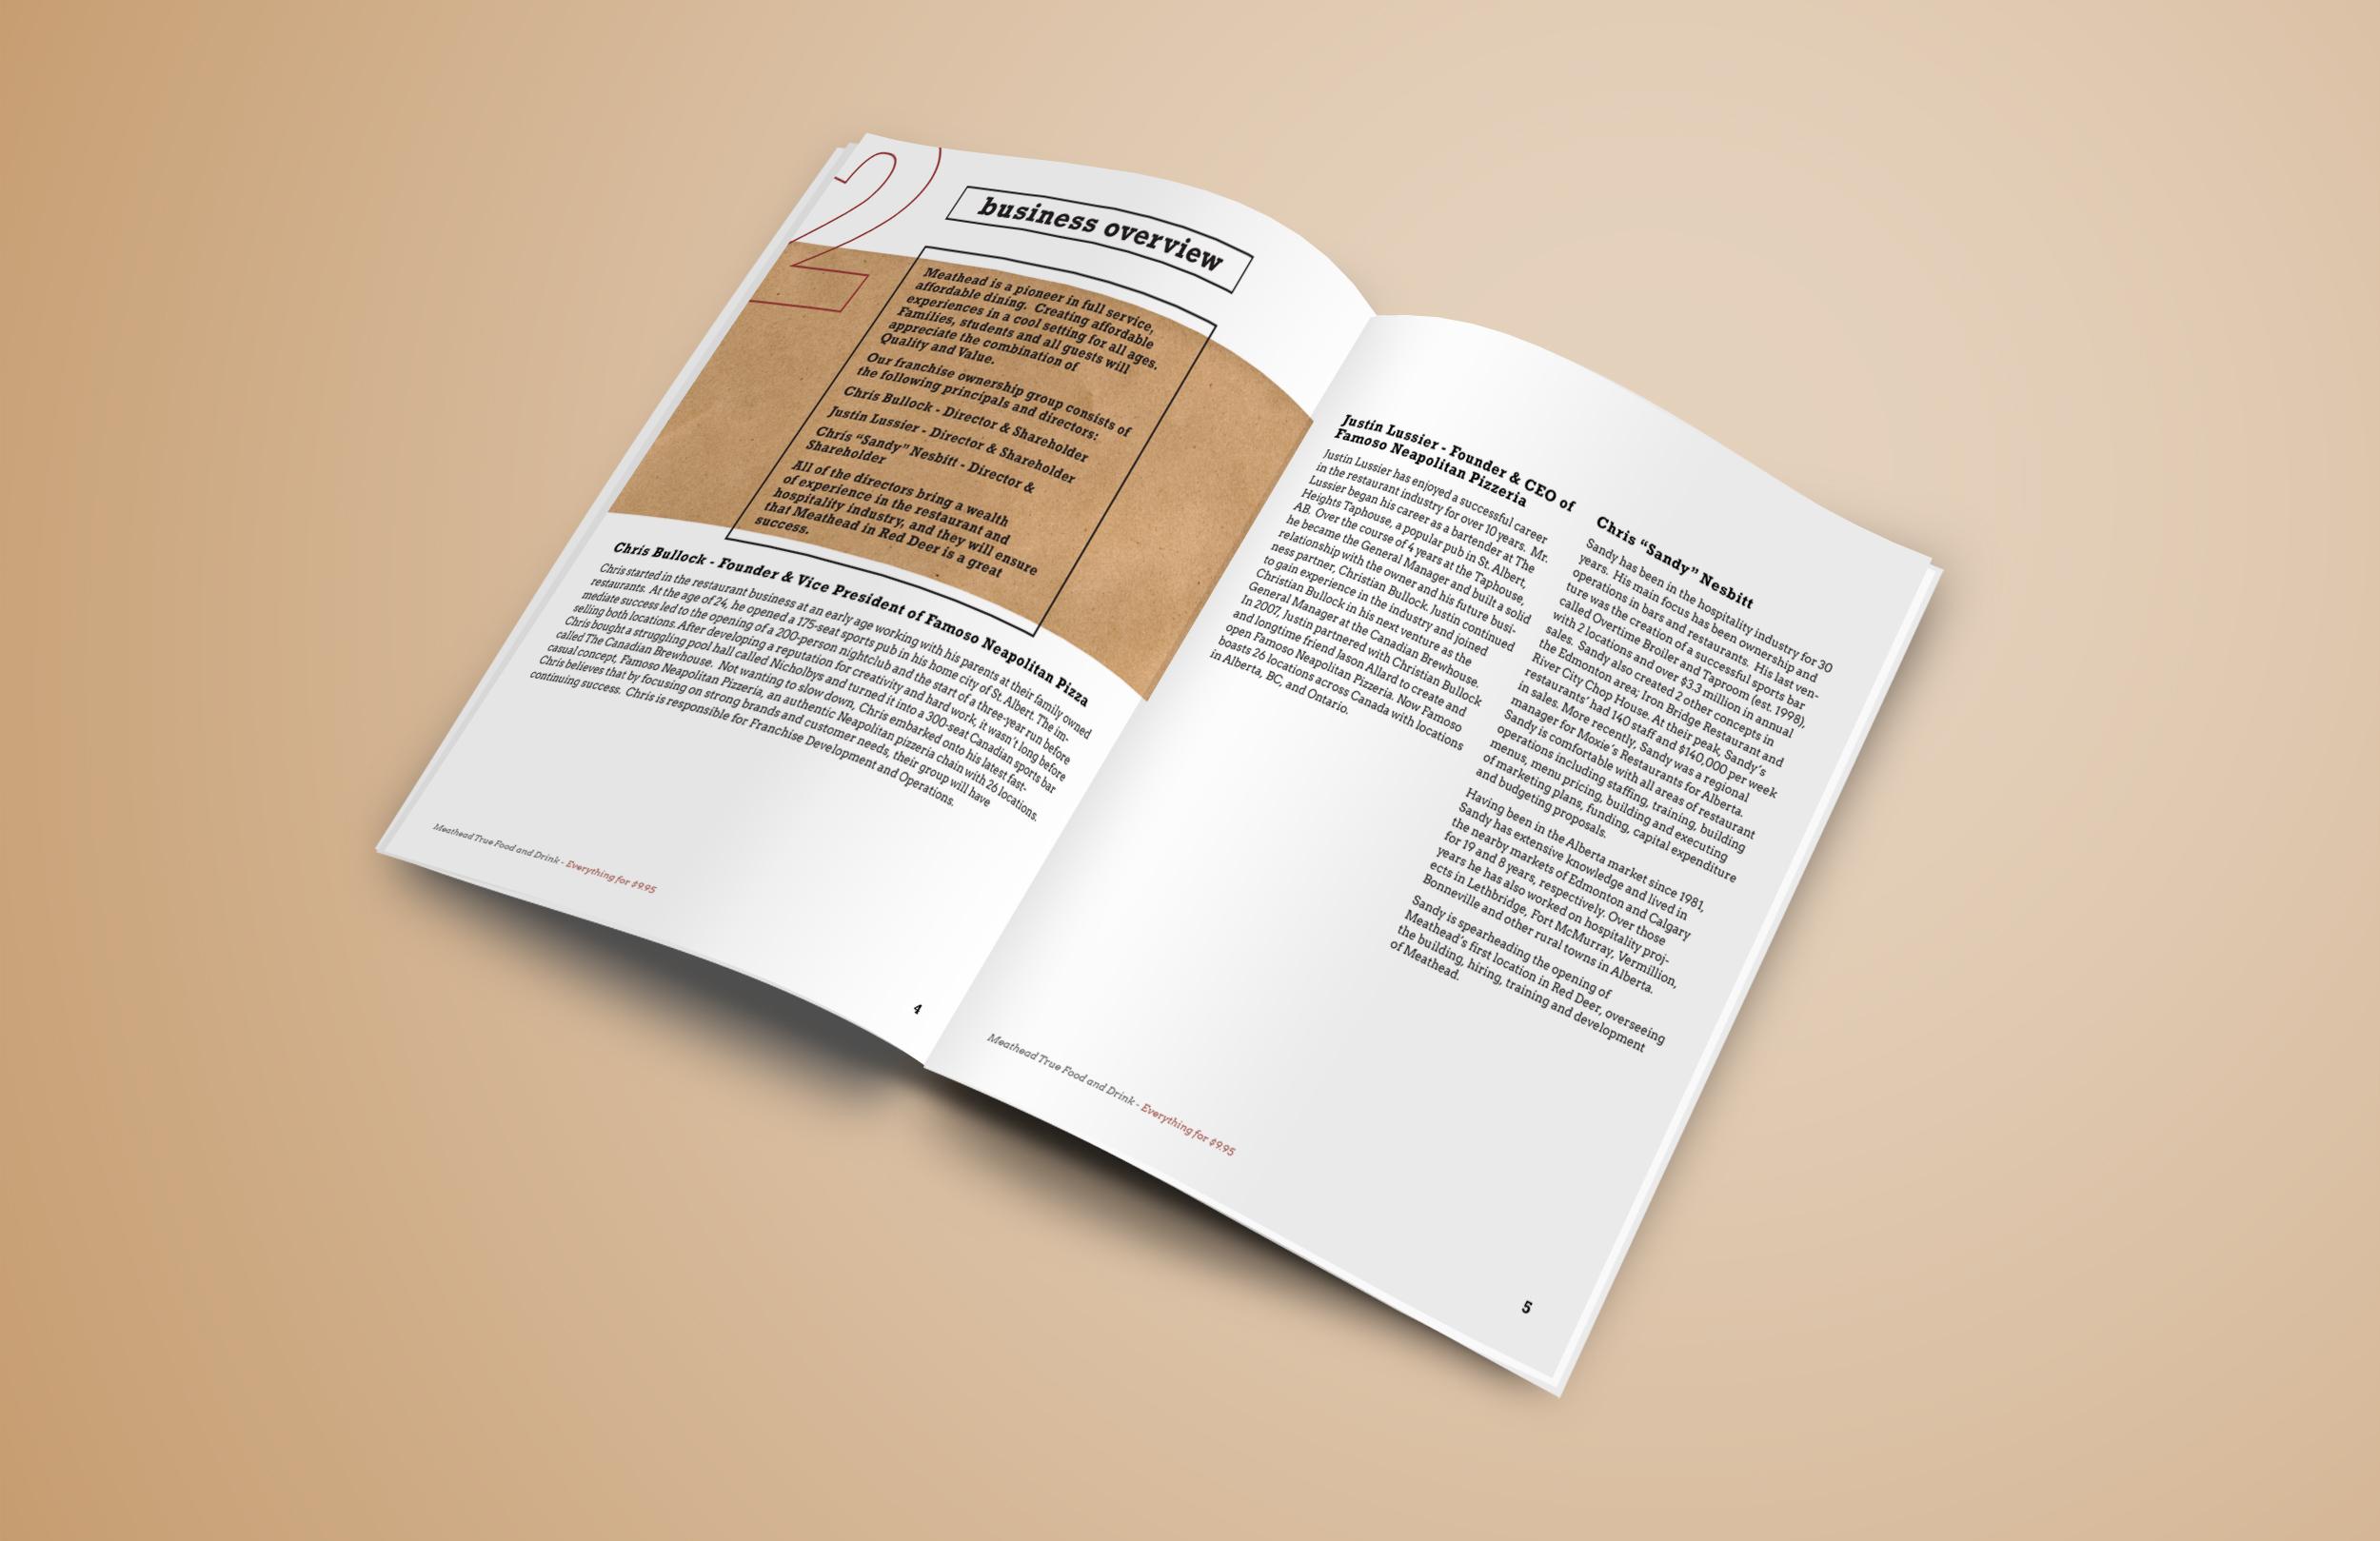 katelynbishop_design_meathead_businessplan2